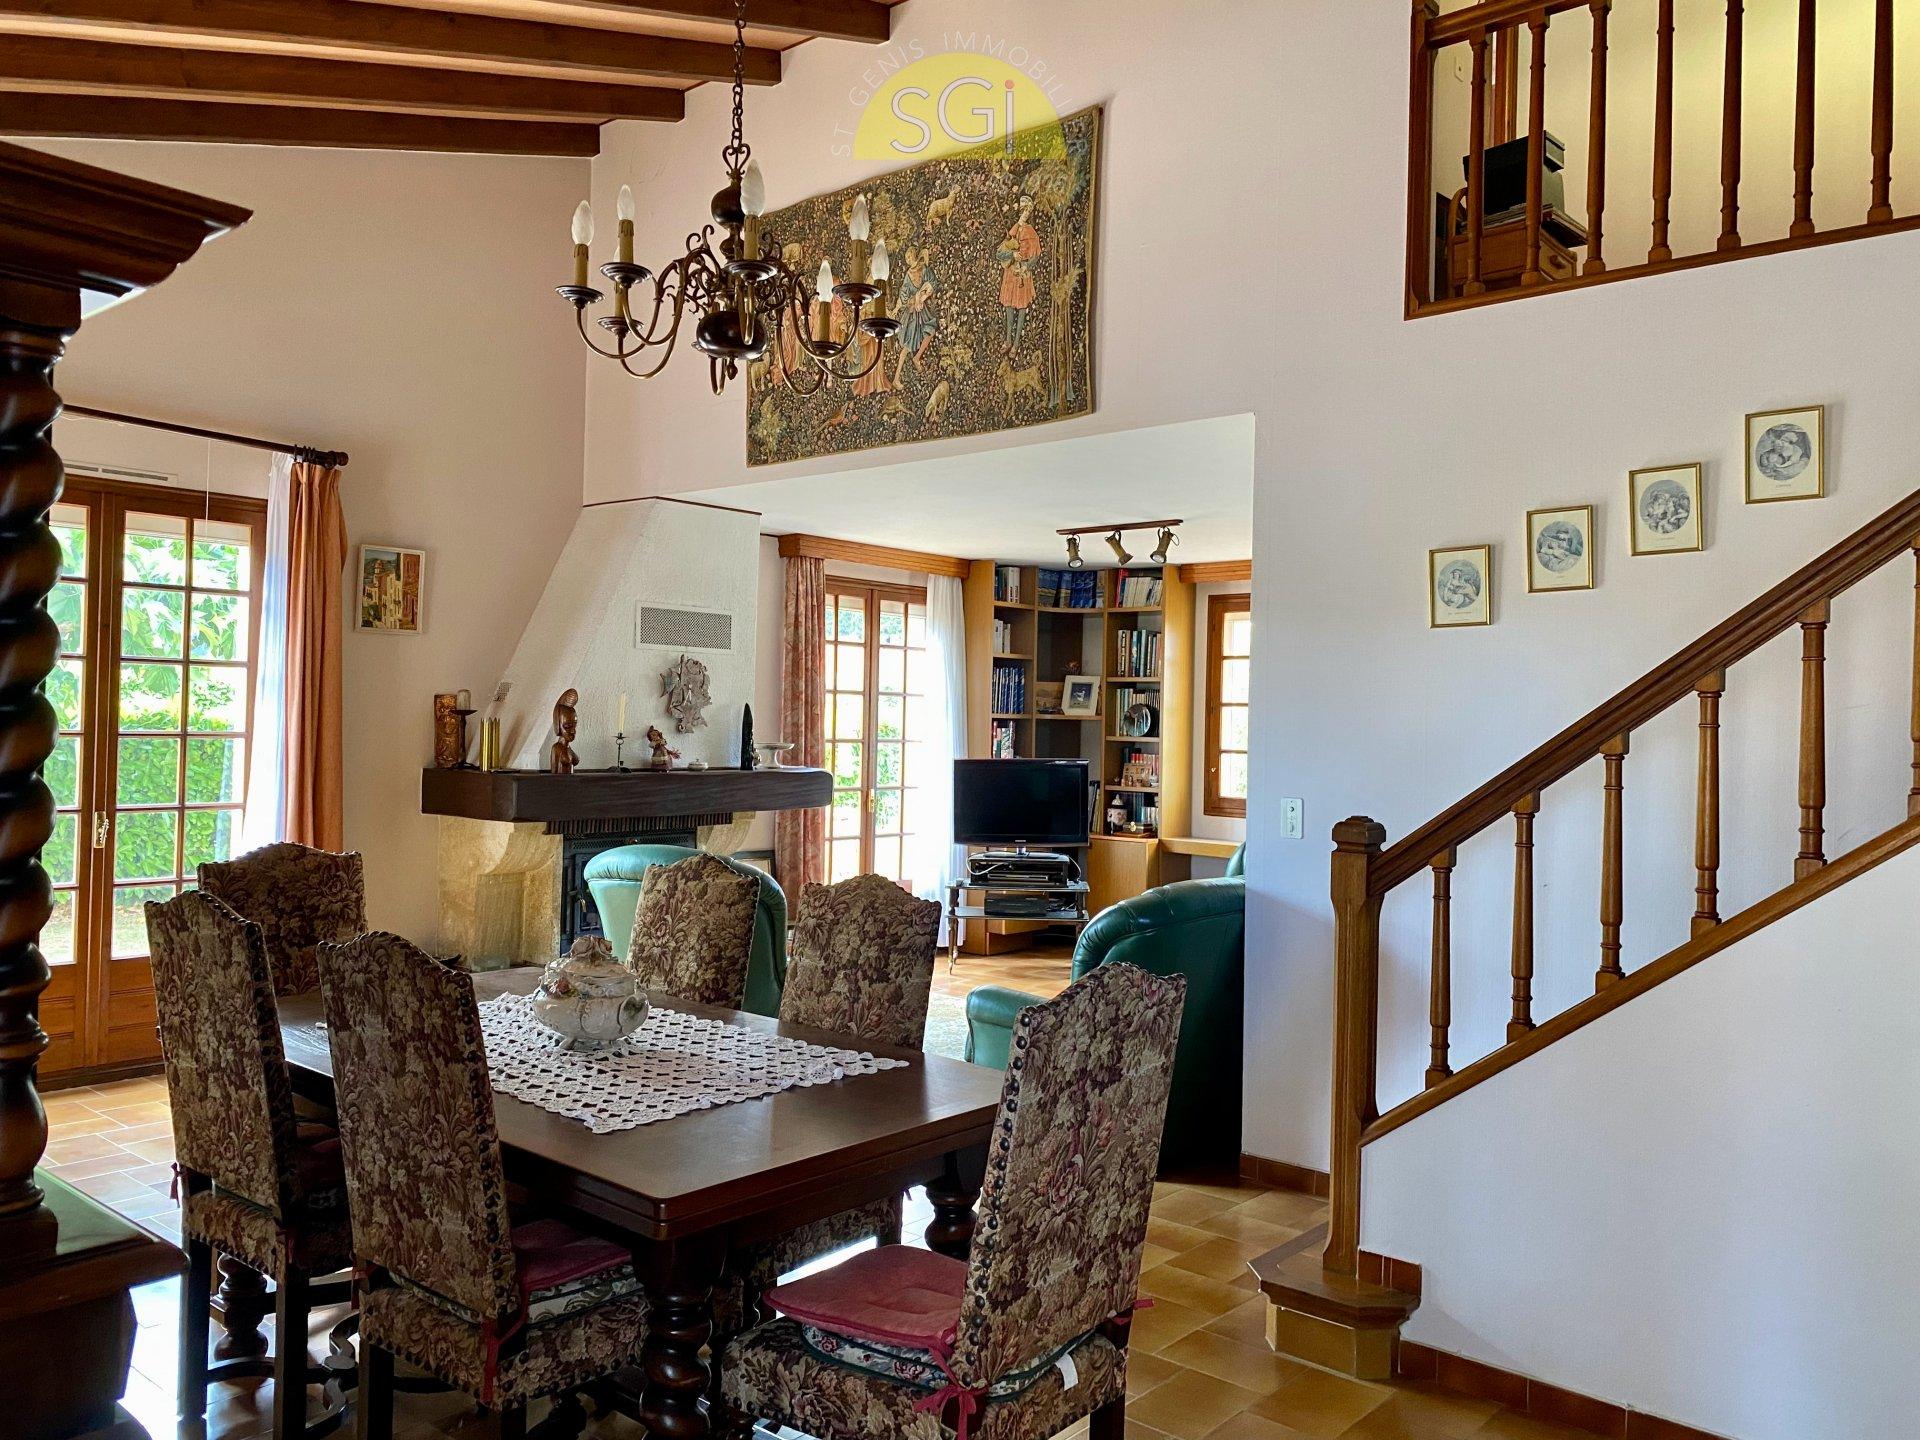 Villa 4 Faces de 152 m2 habitable